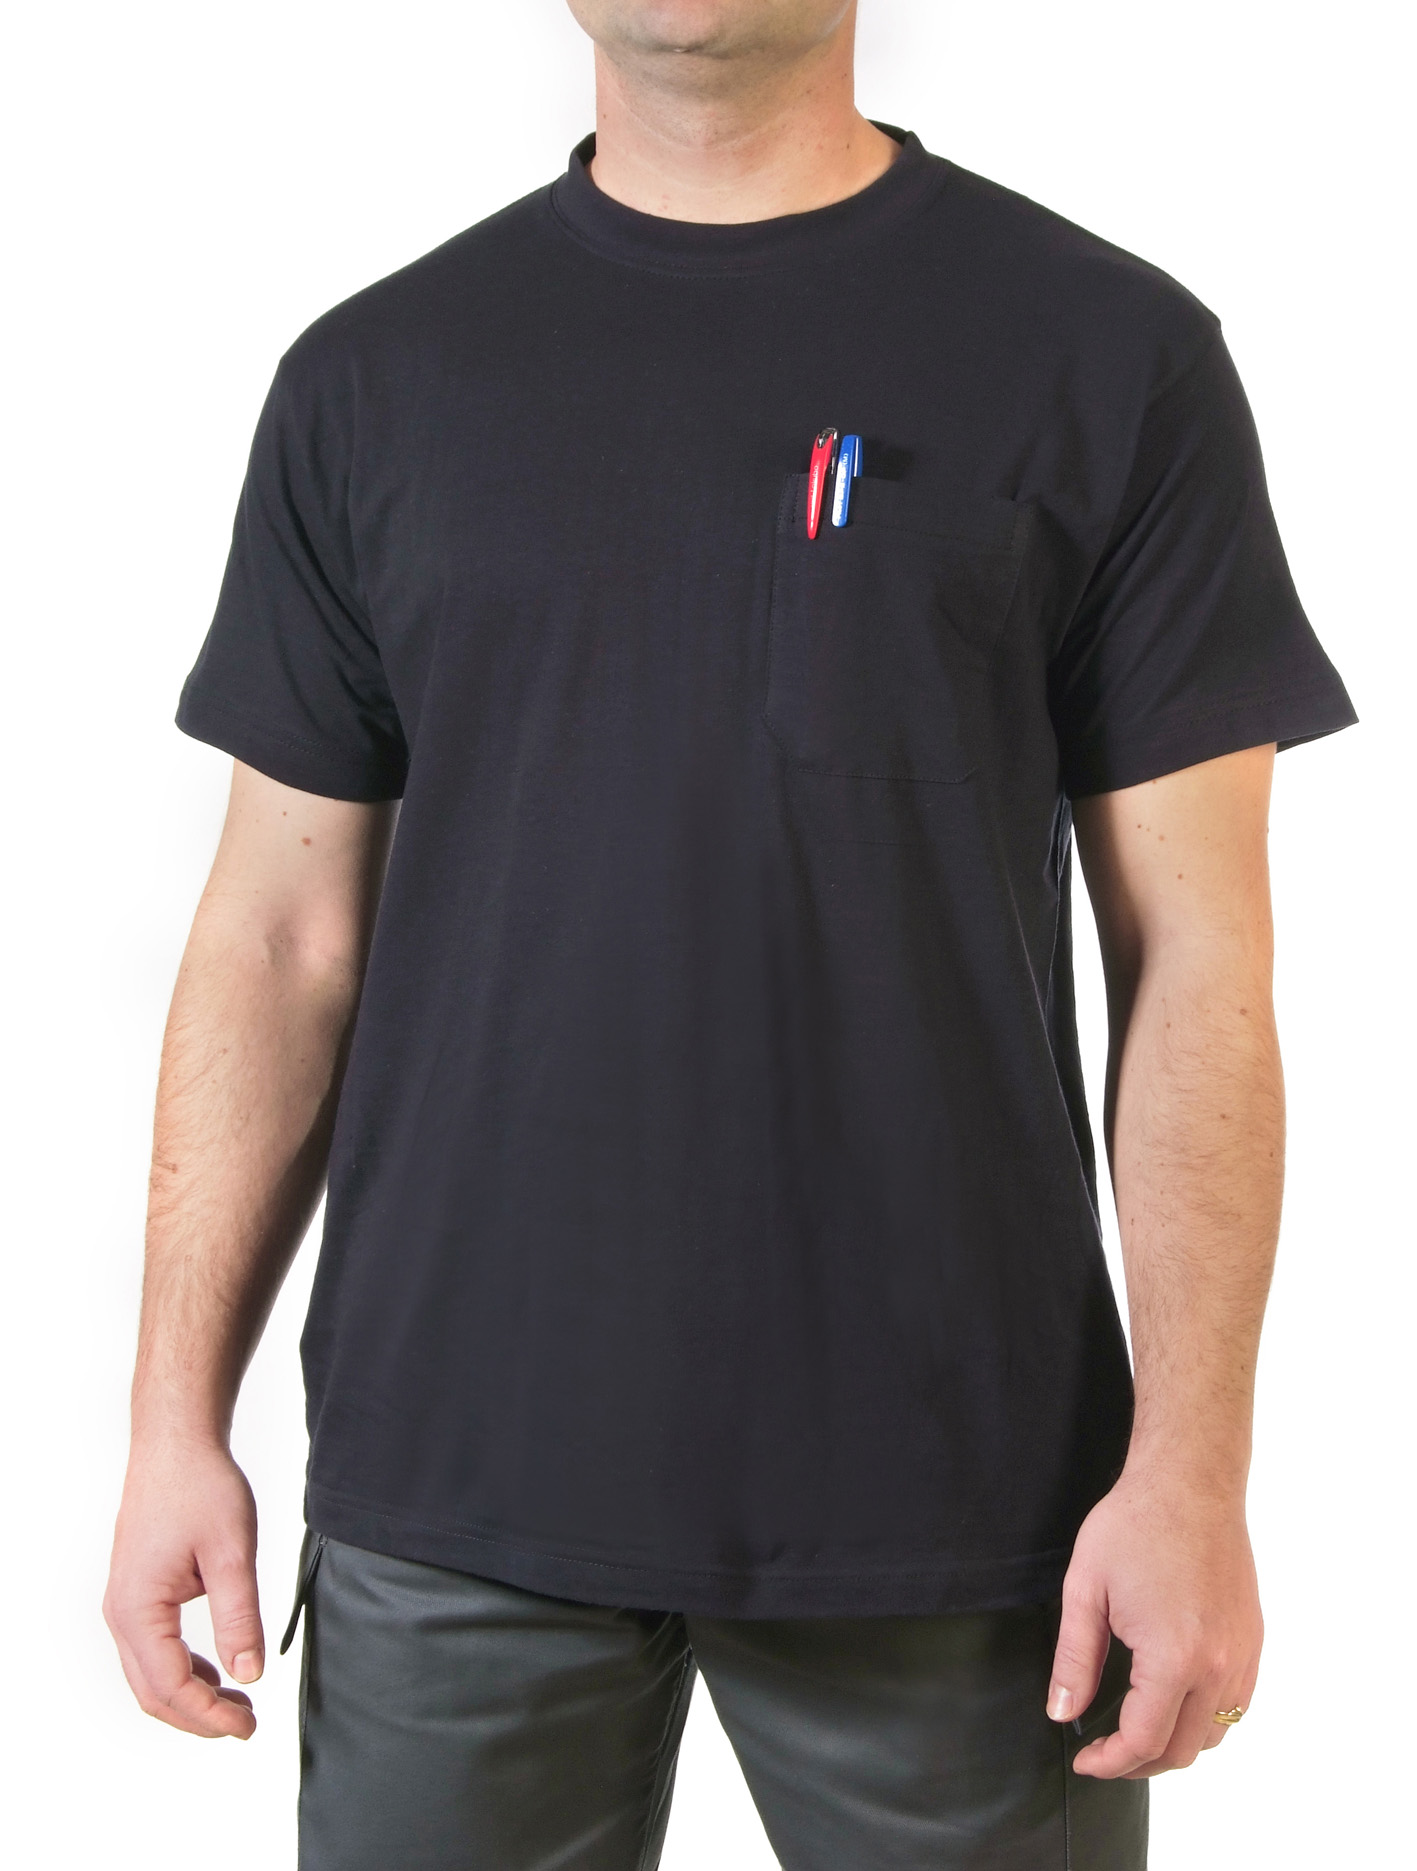 Short sleeve navy t-shirt with pocket Image